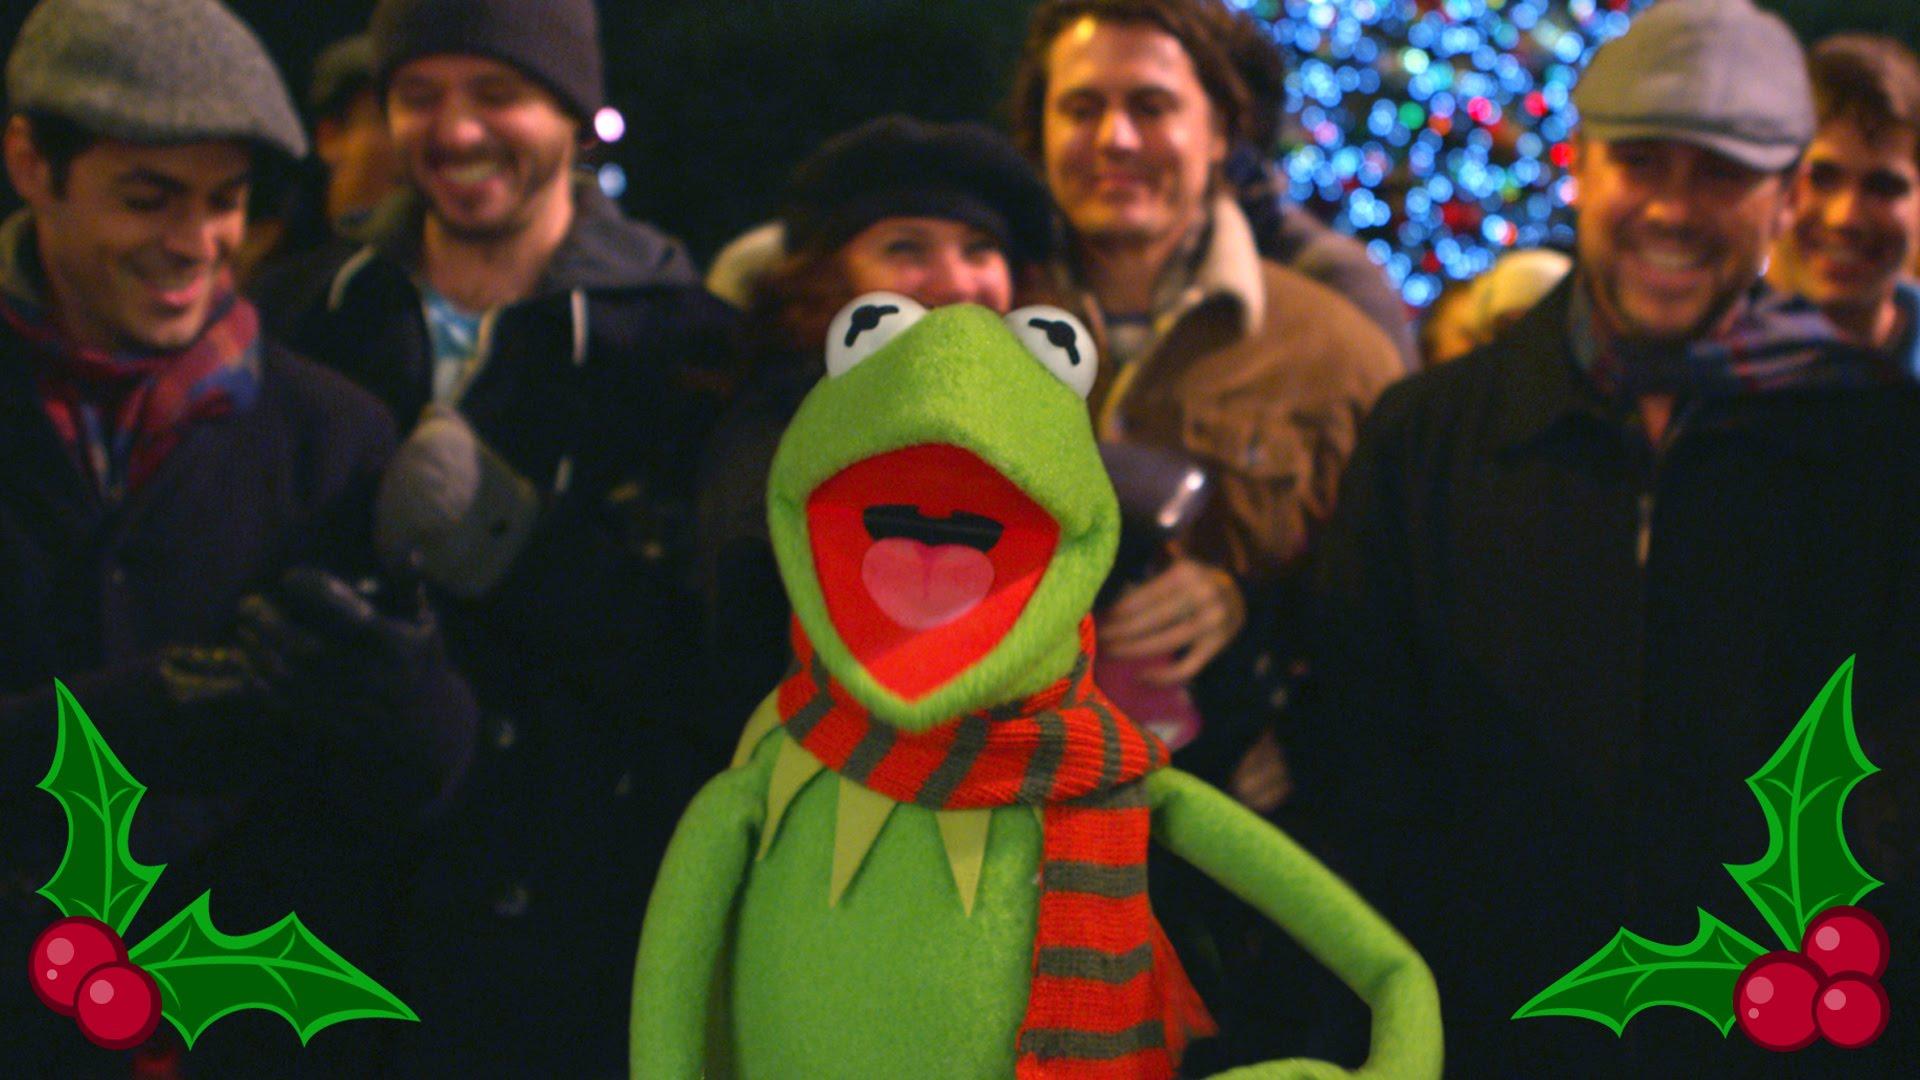 Kermit the Frog Singing \u0027It Feels Like Christmas\u0027 From \u0027The